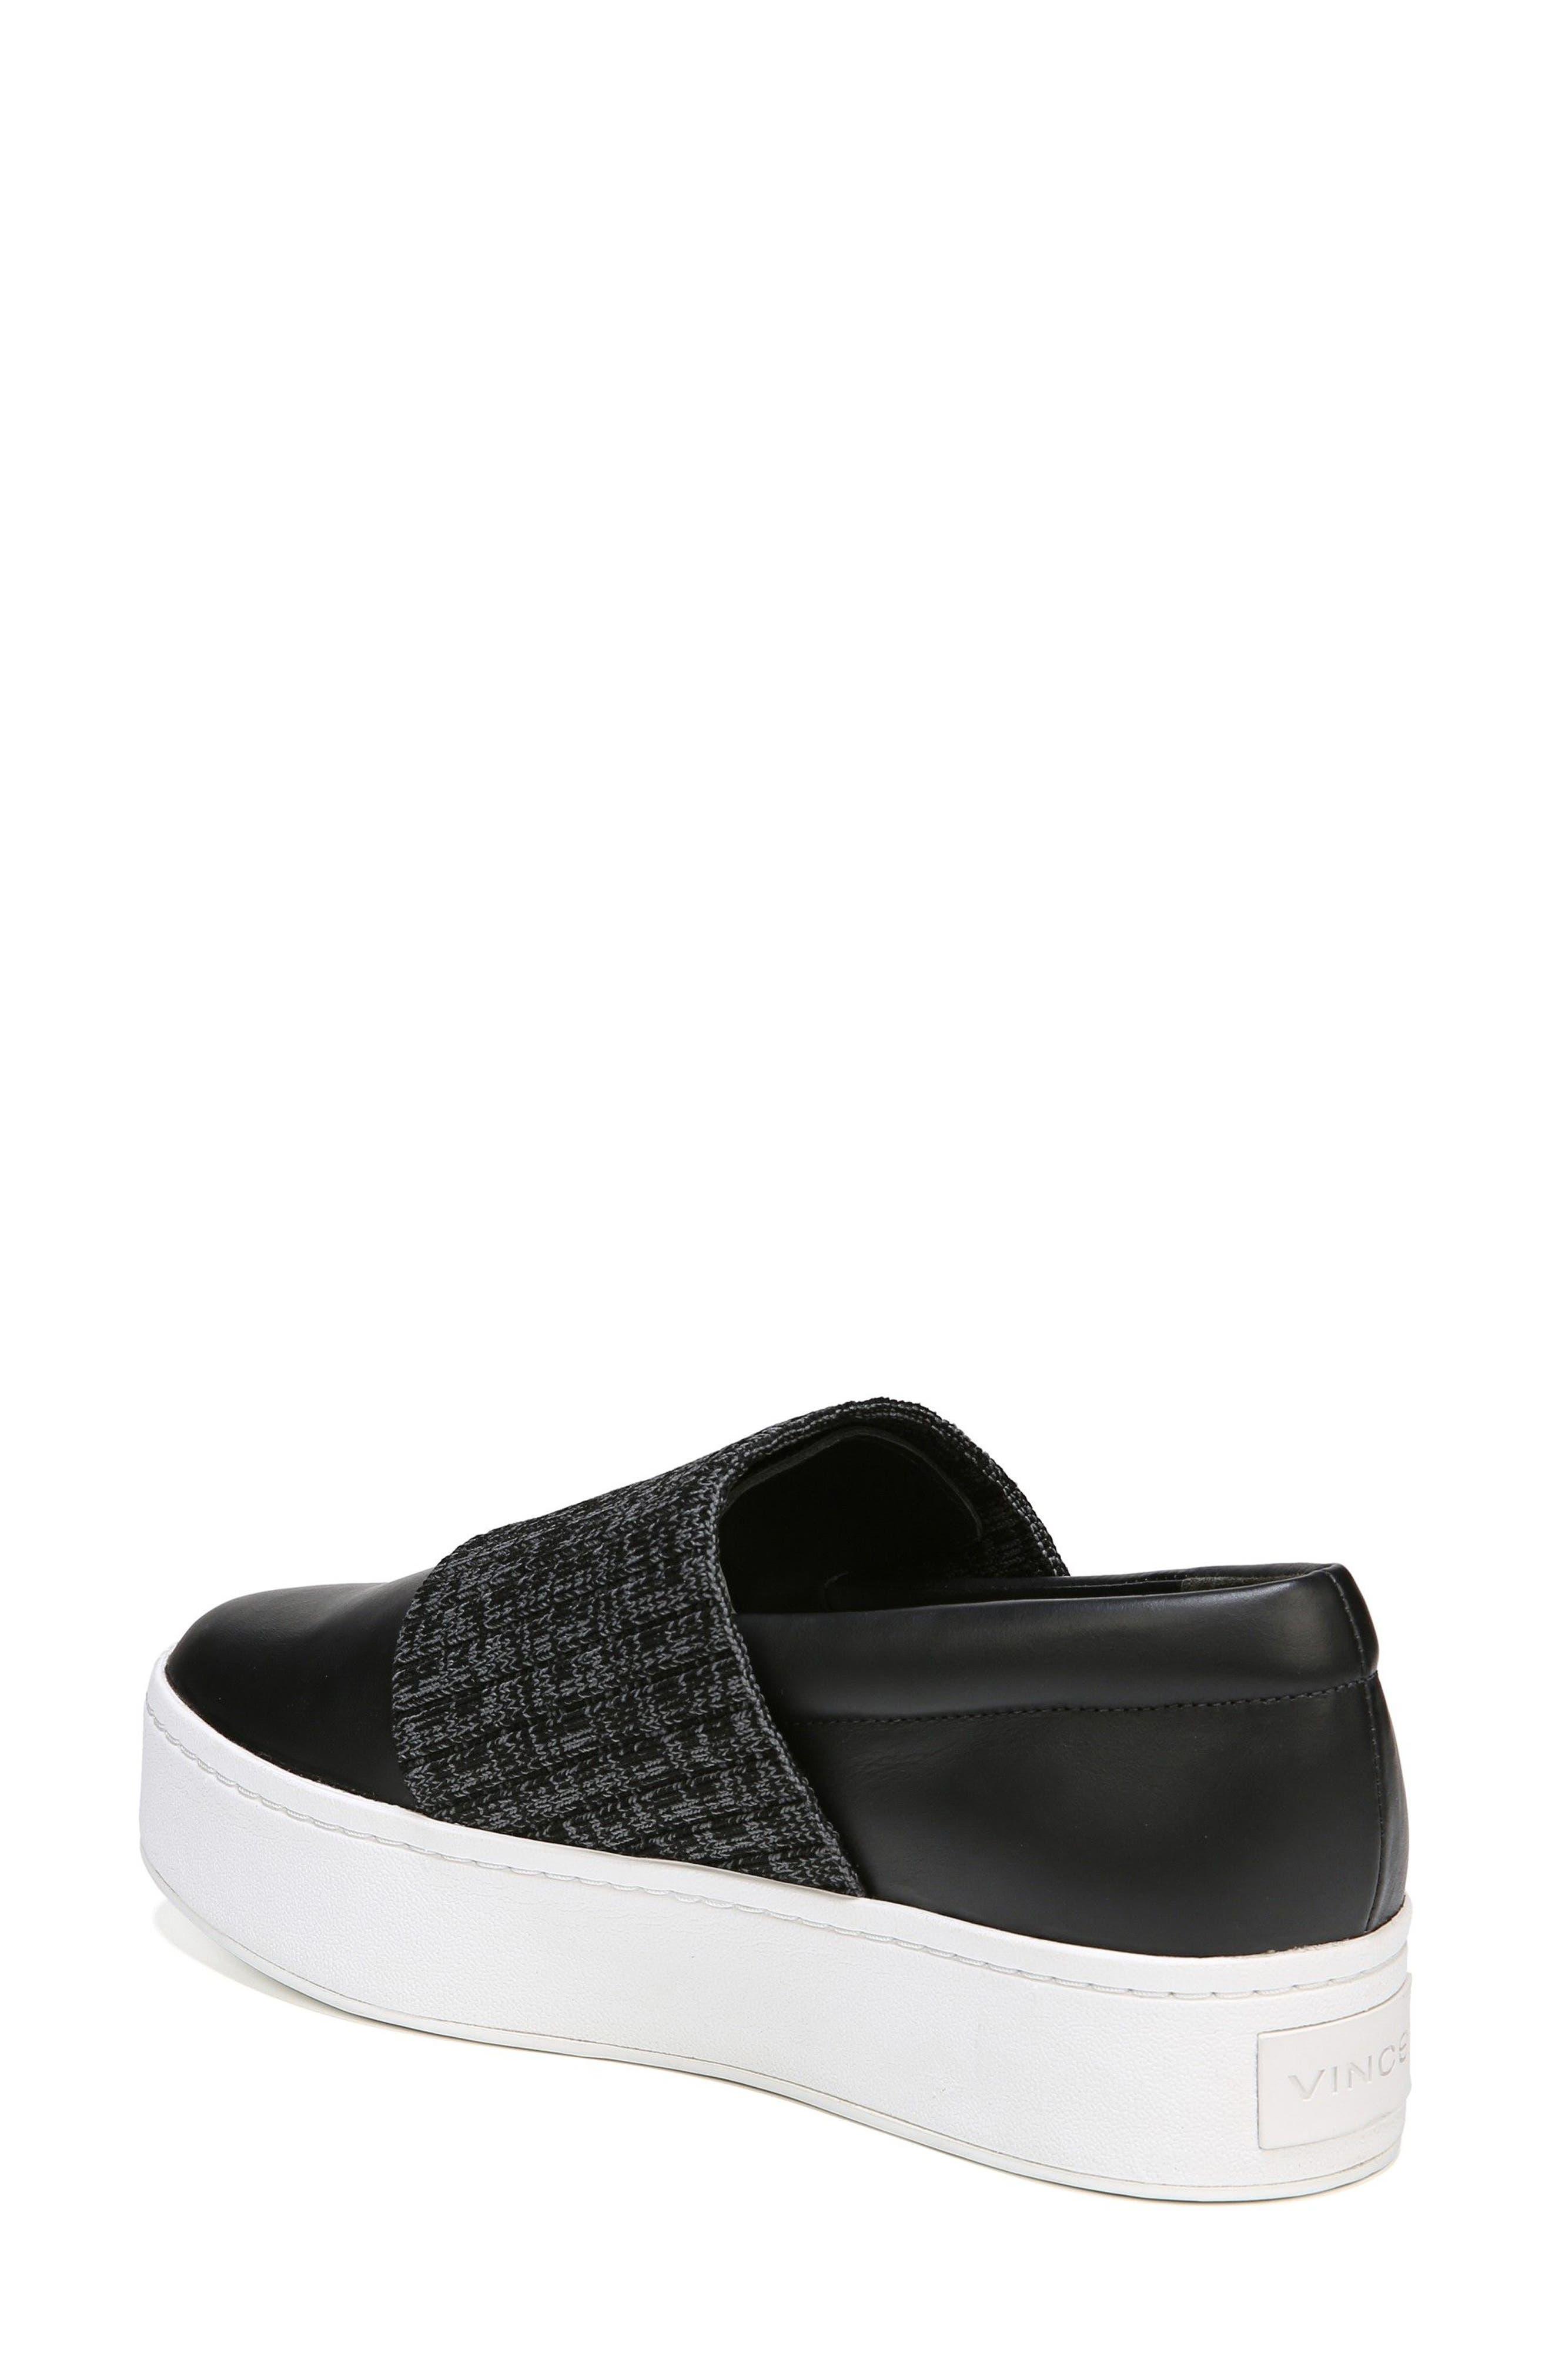 Weadon Slip-On Sneaker,                             Alternate thumbnail 2, color,                             Black Siviglia Calf